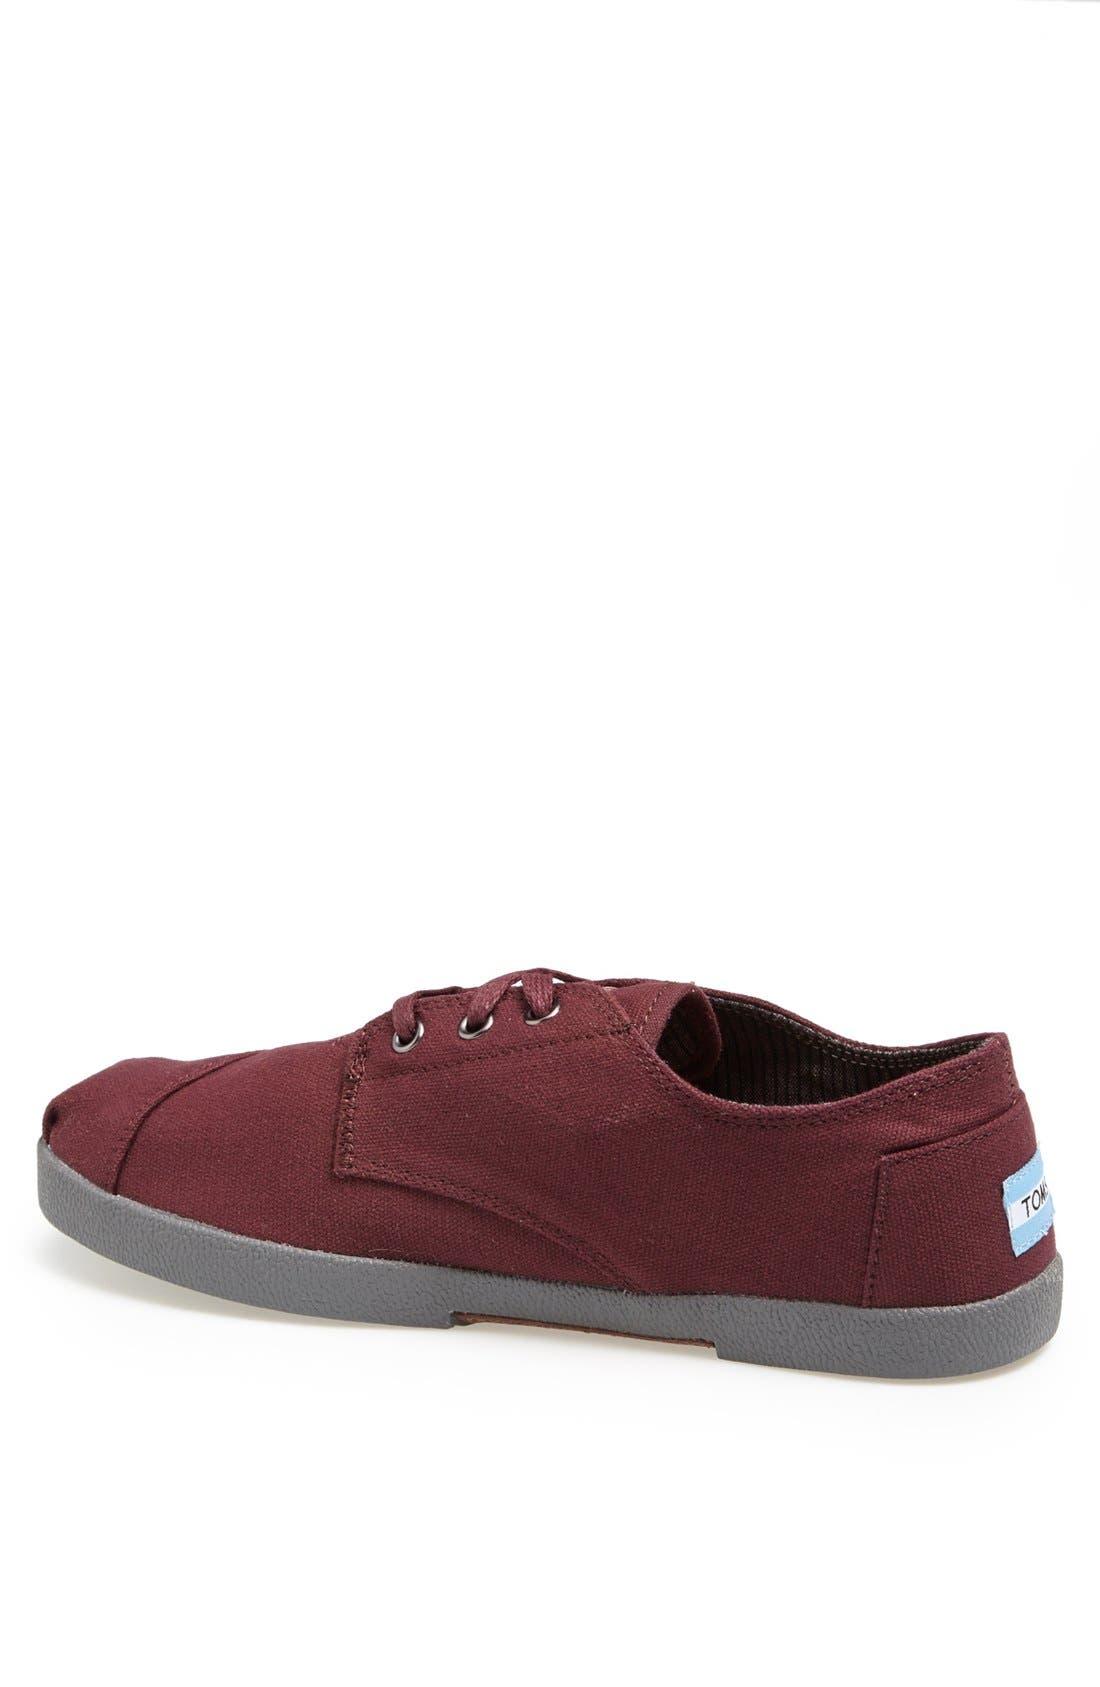 Alternate Image 2  - TOMS 'Paseos' Sneaker (Men)